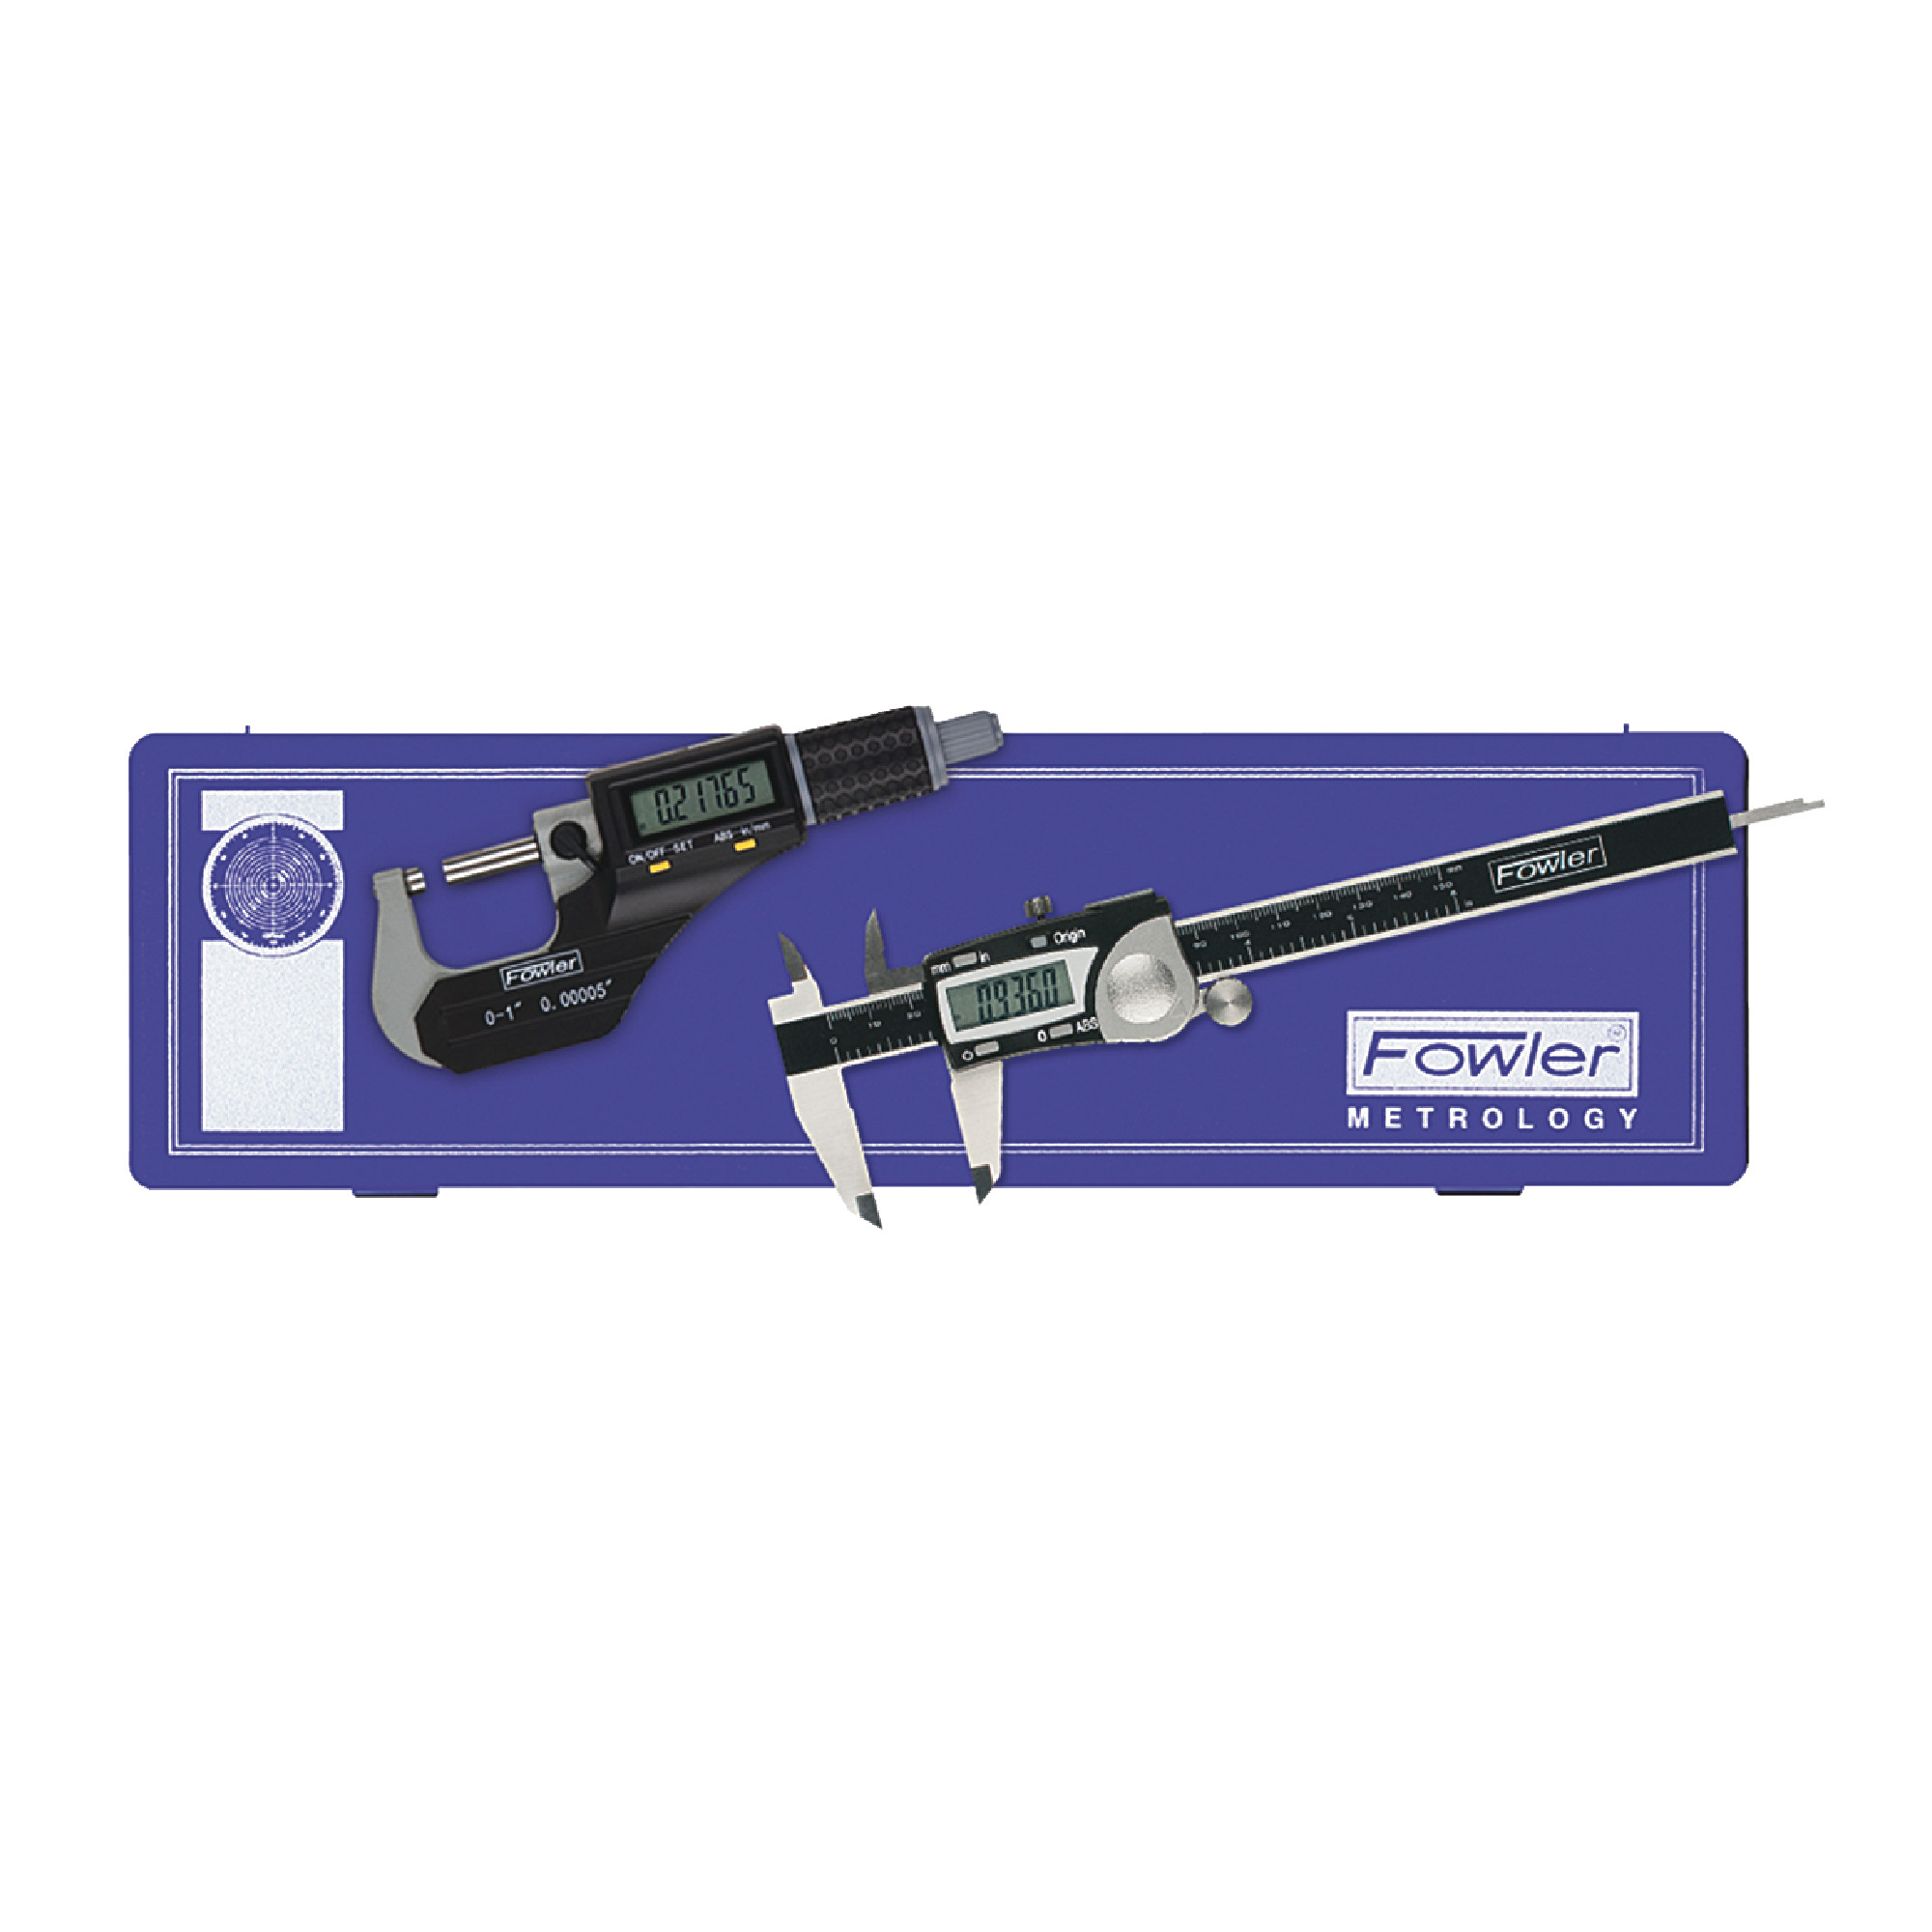 Electronic Caliper & Micrometer Set